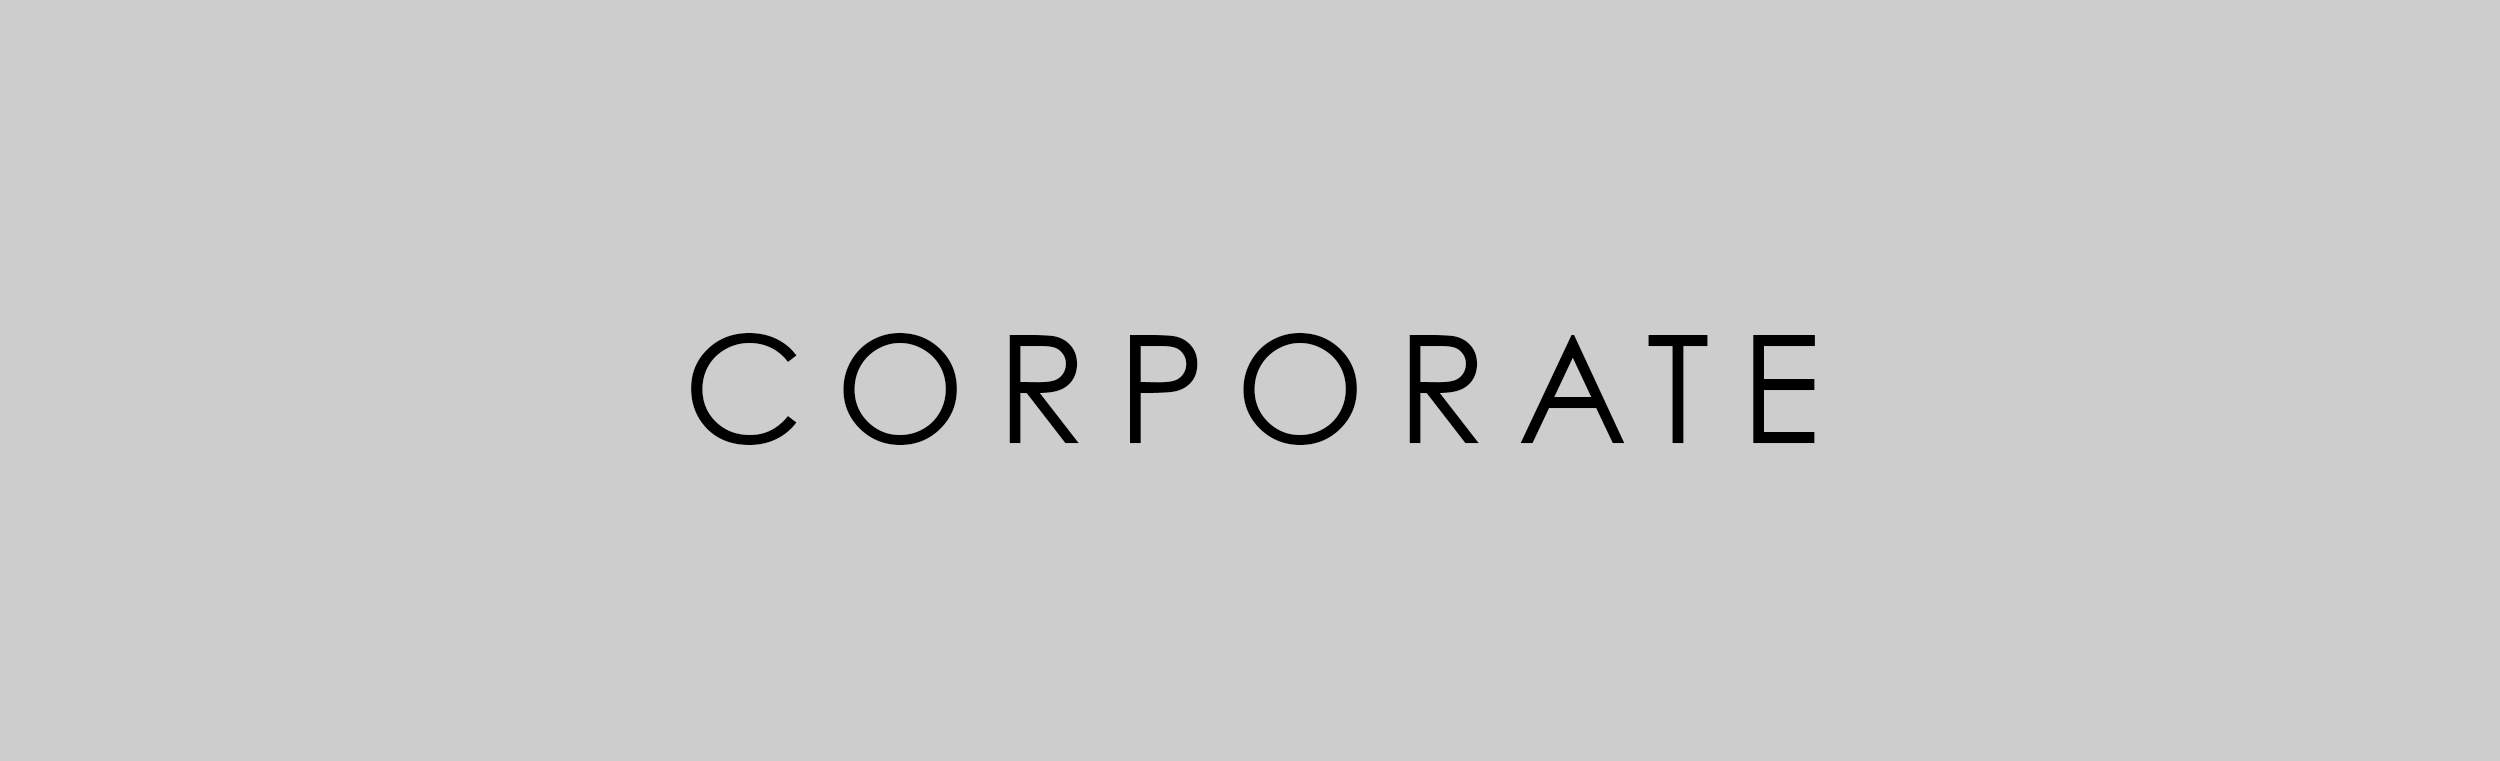 Corporate Button.jpg